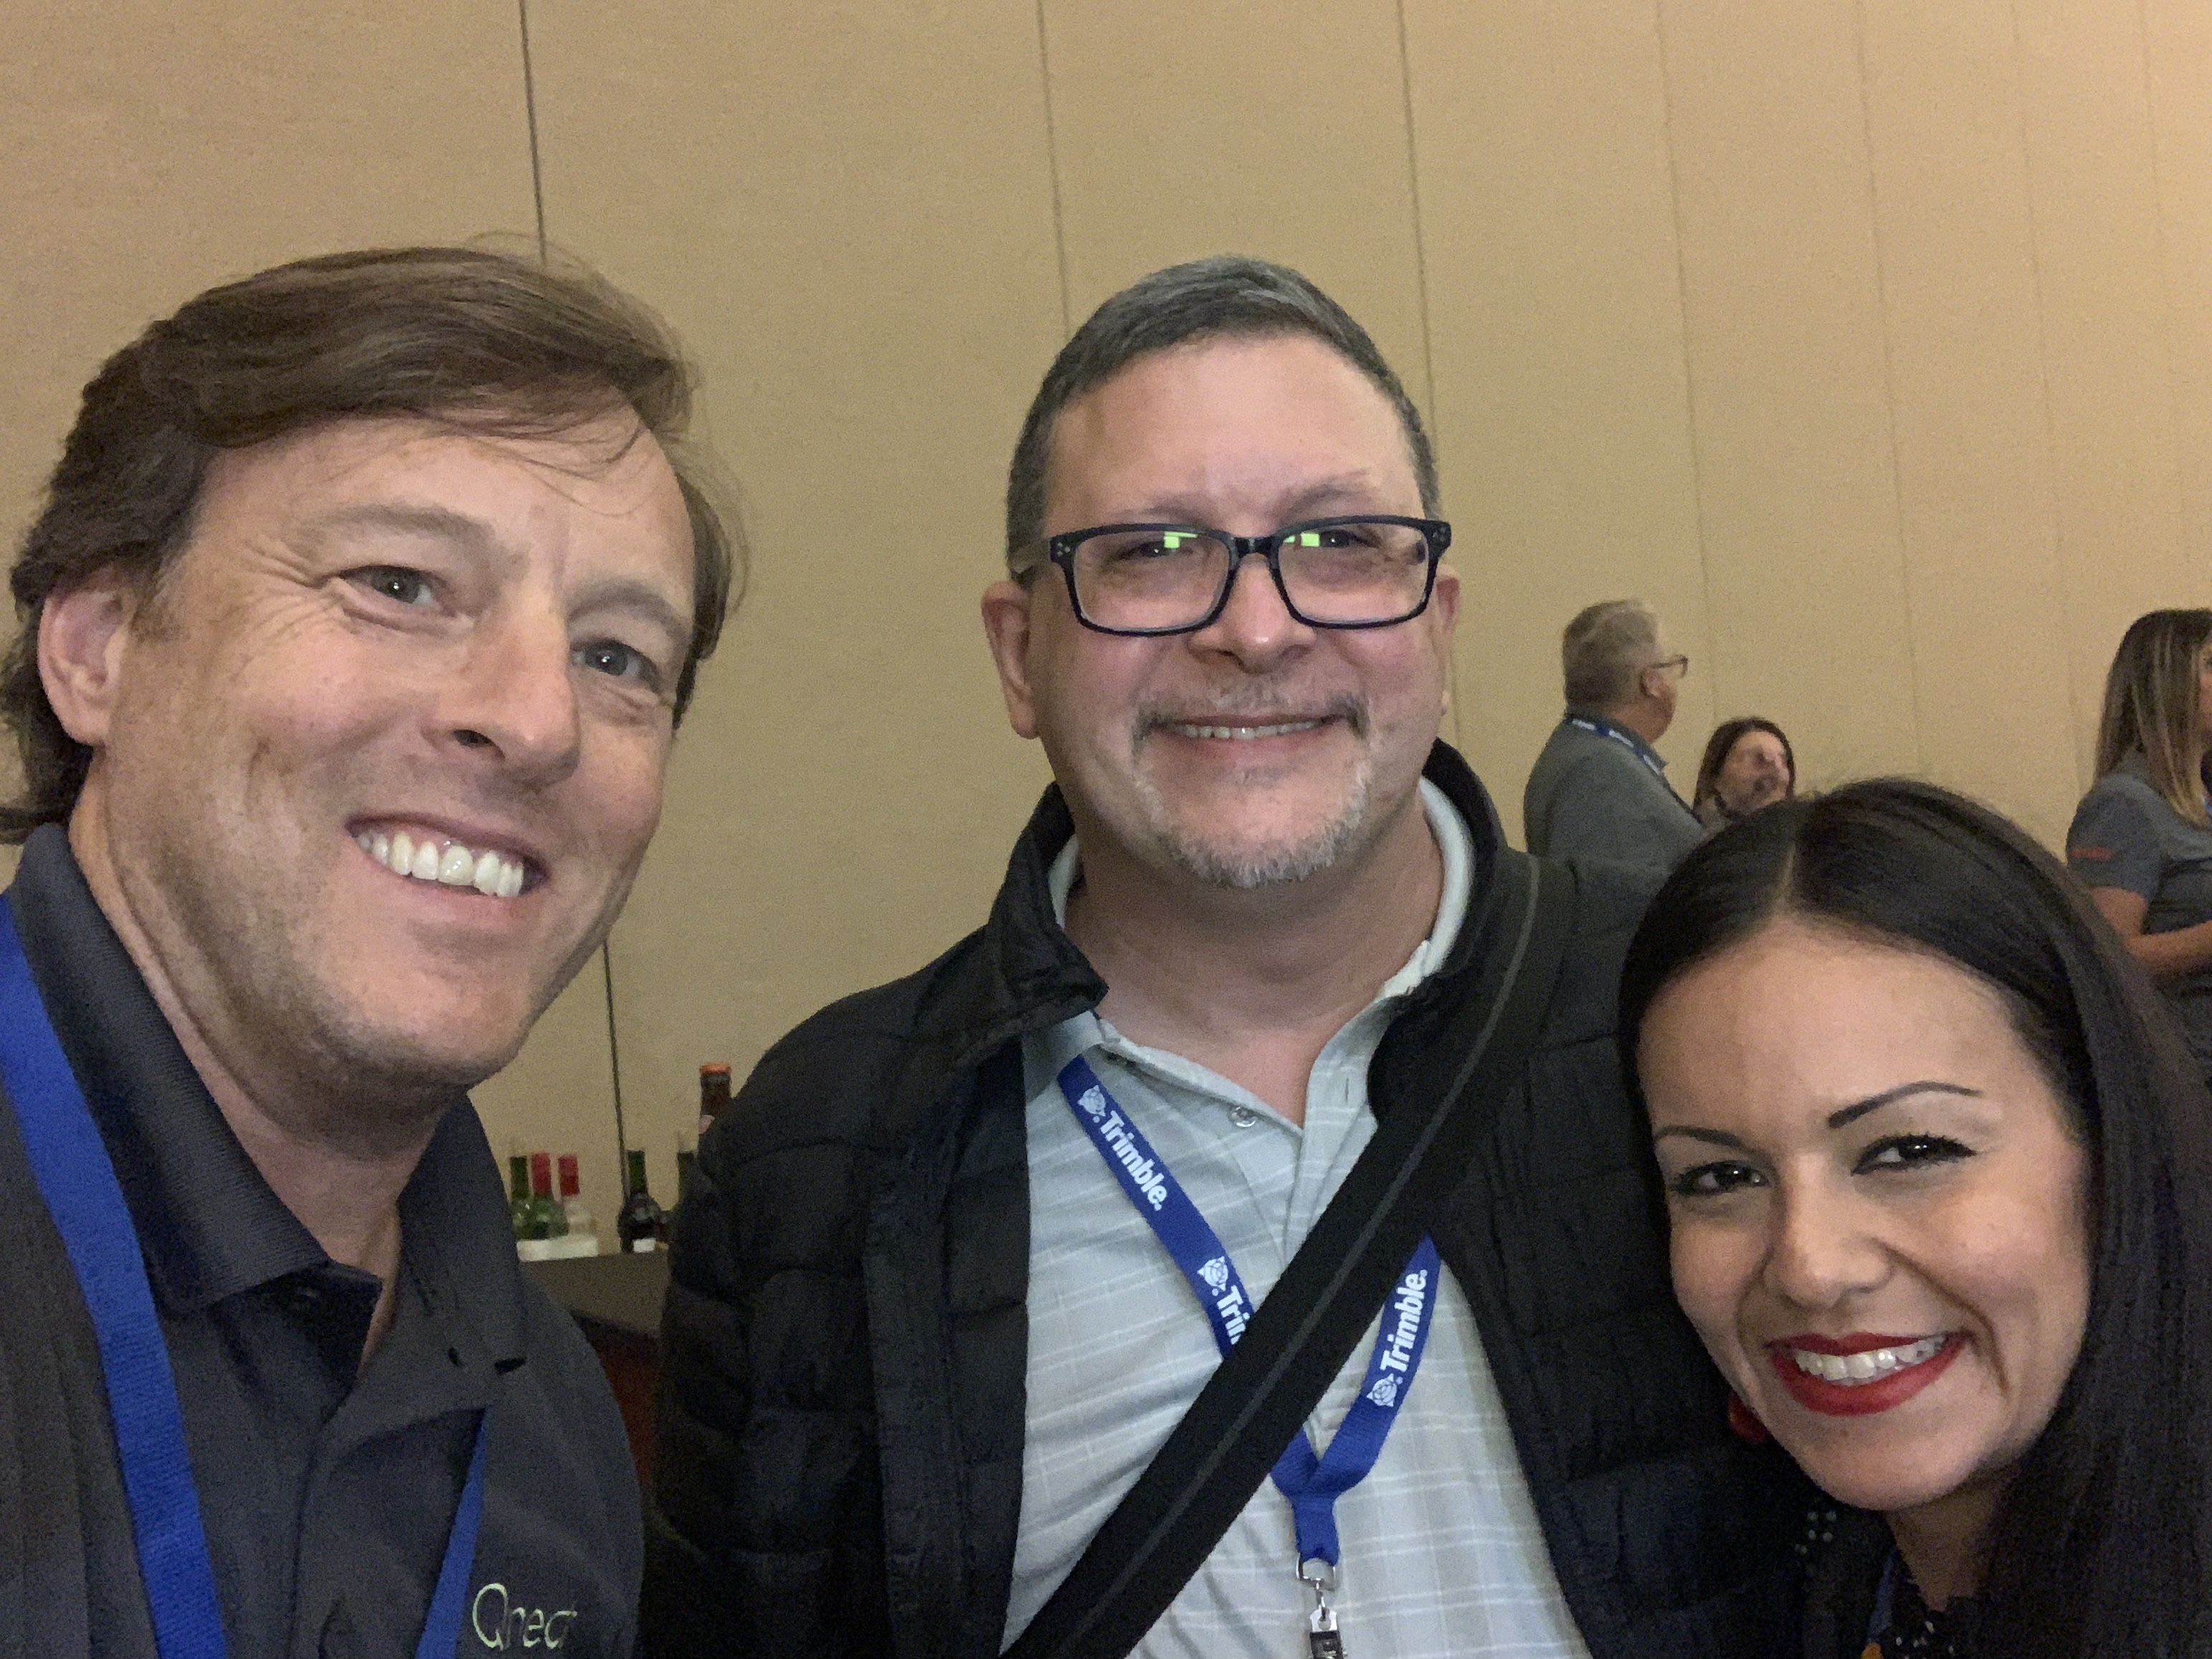 Christian Erickson Marketing Leader with Customers